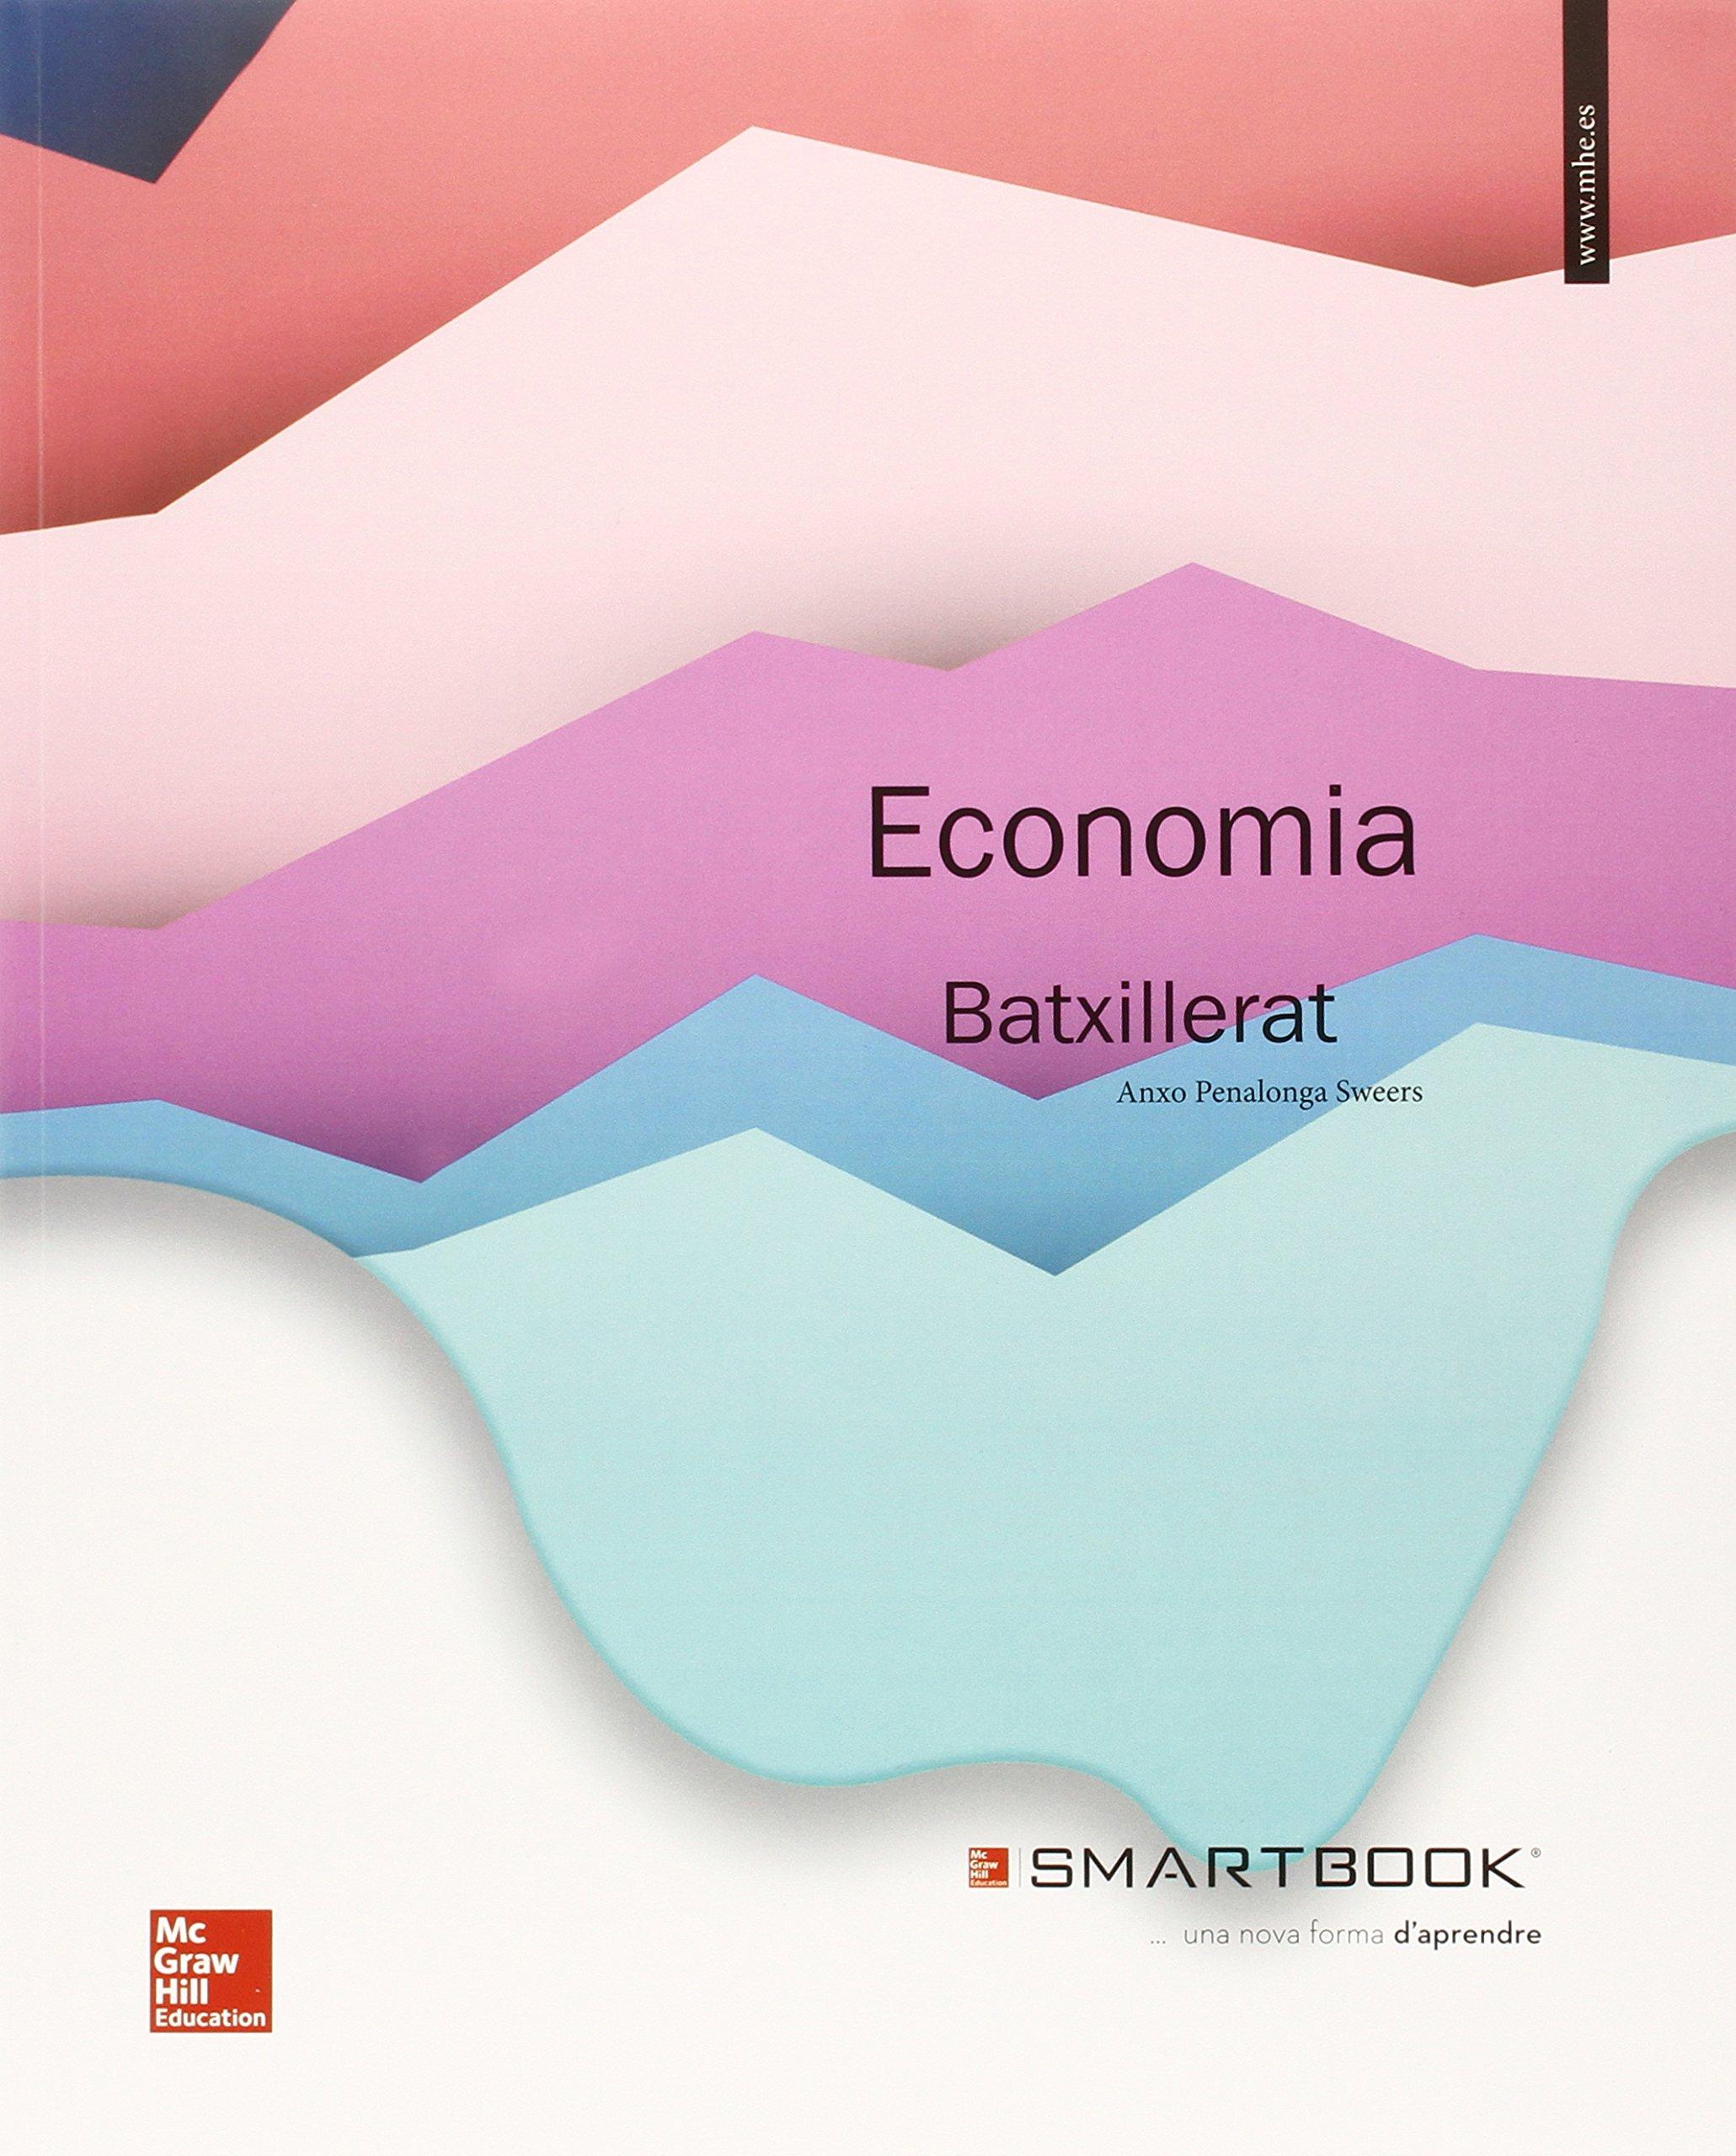 Economía. Penalonga. Batxillerat 1 - Edició 2015 (+ Smartbook) - 9788448195991 Tapa blanda – 15 jun 2015 Anxo Penalonga 844819599X Economics Educational material